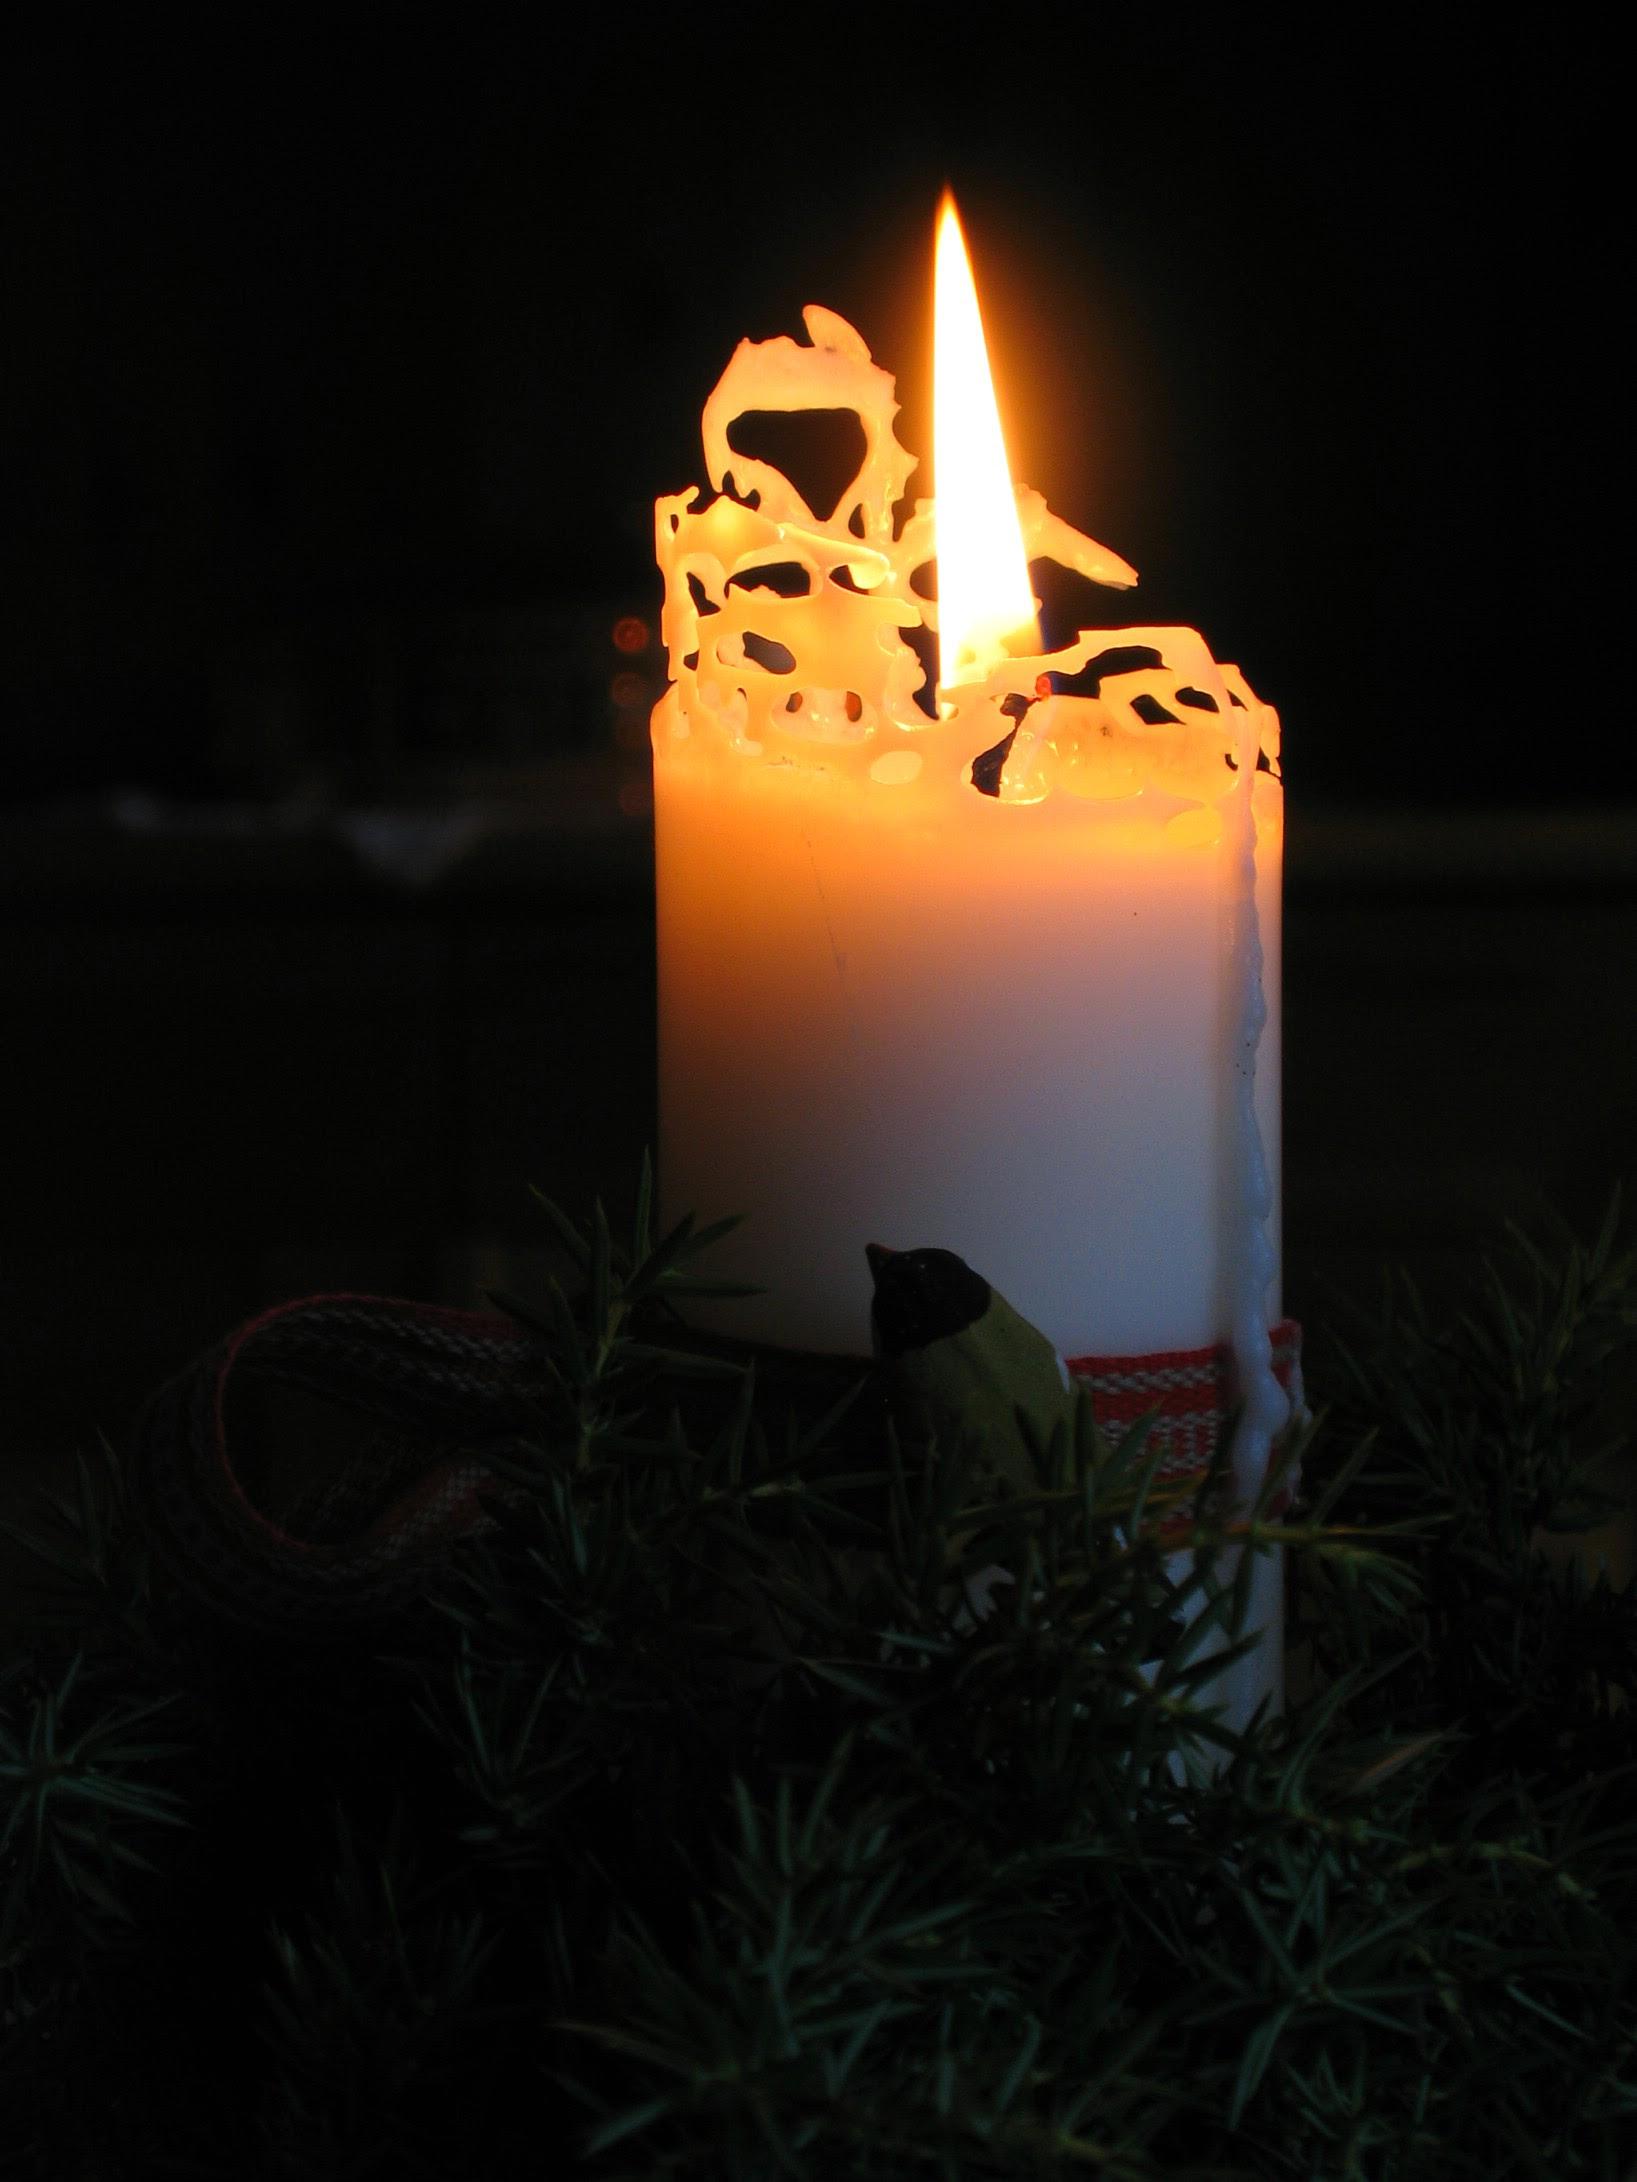 Brinnande ljus